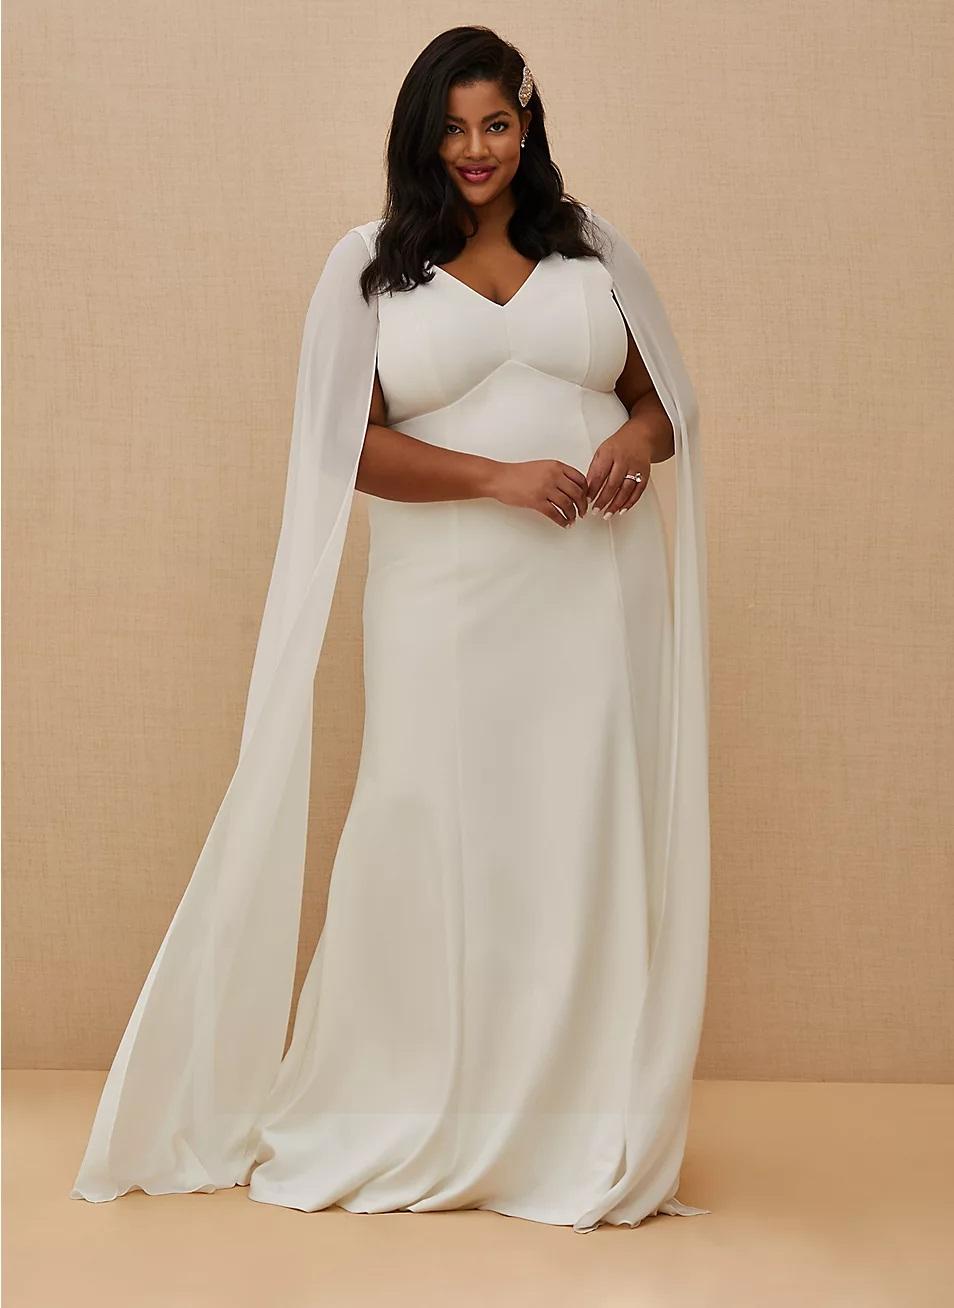 torrid wedding dress with white cape sleeves